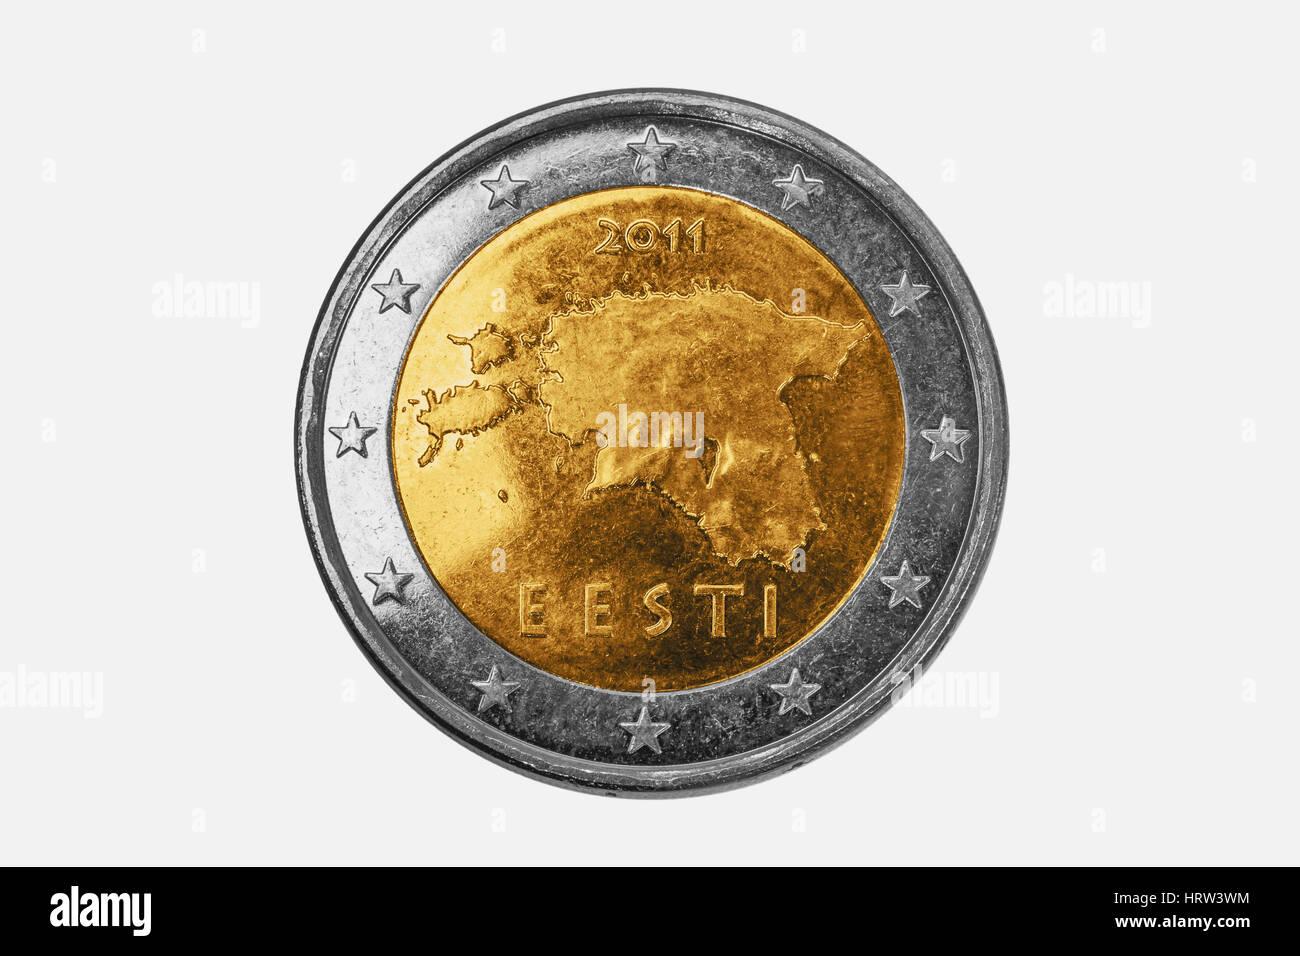 a 2 euro coin from Estonia on white background Stock Photo